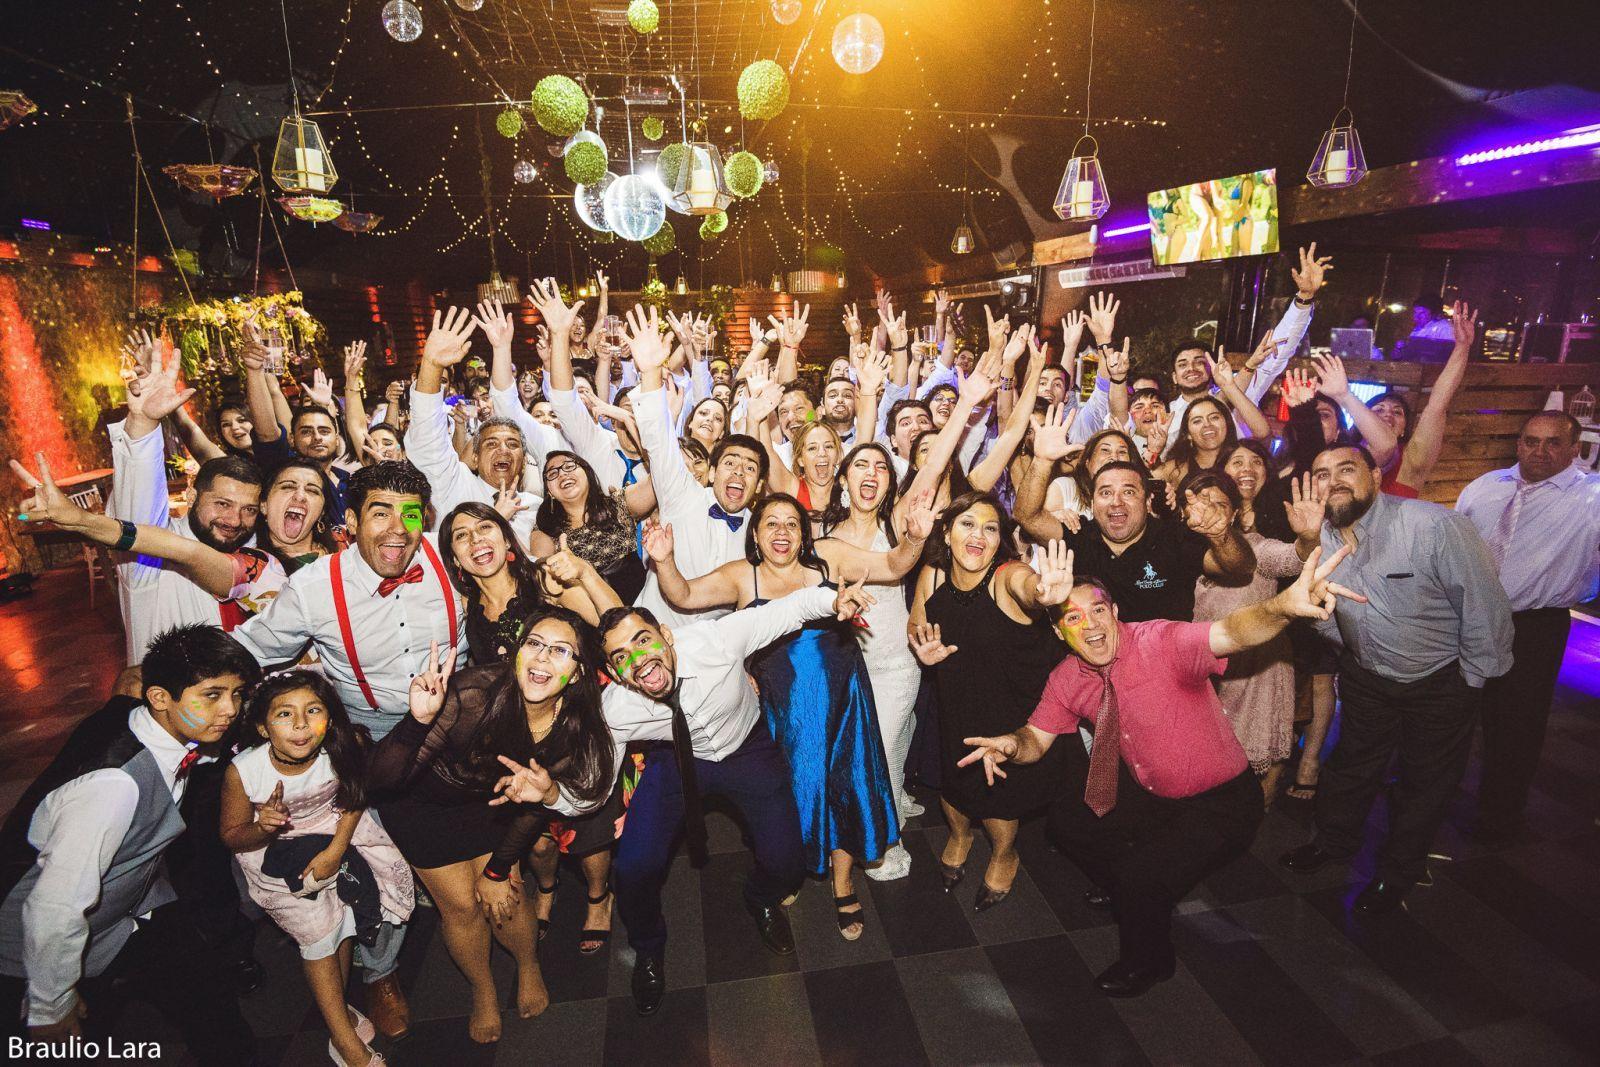 wedding Braulio lara photographer the best fotógrafo praga chile